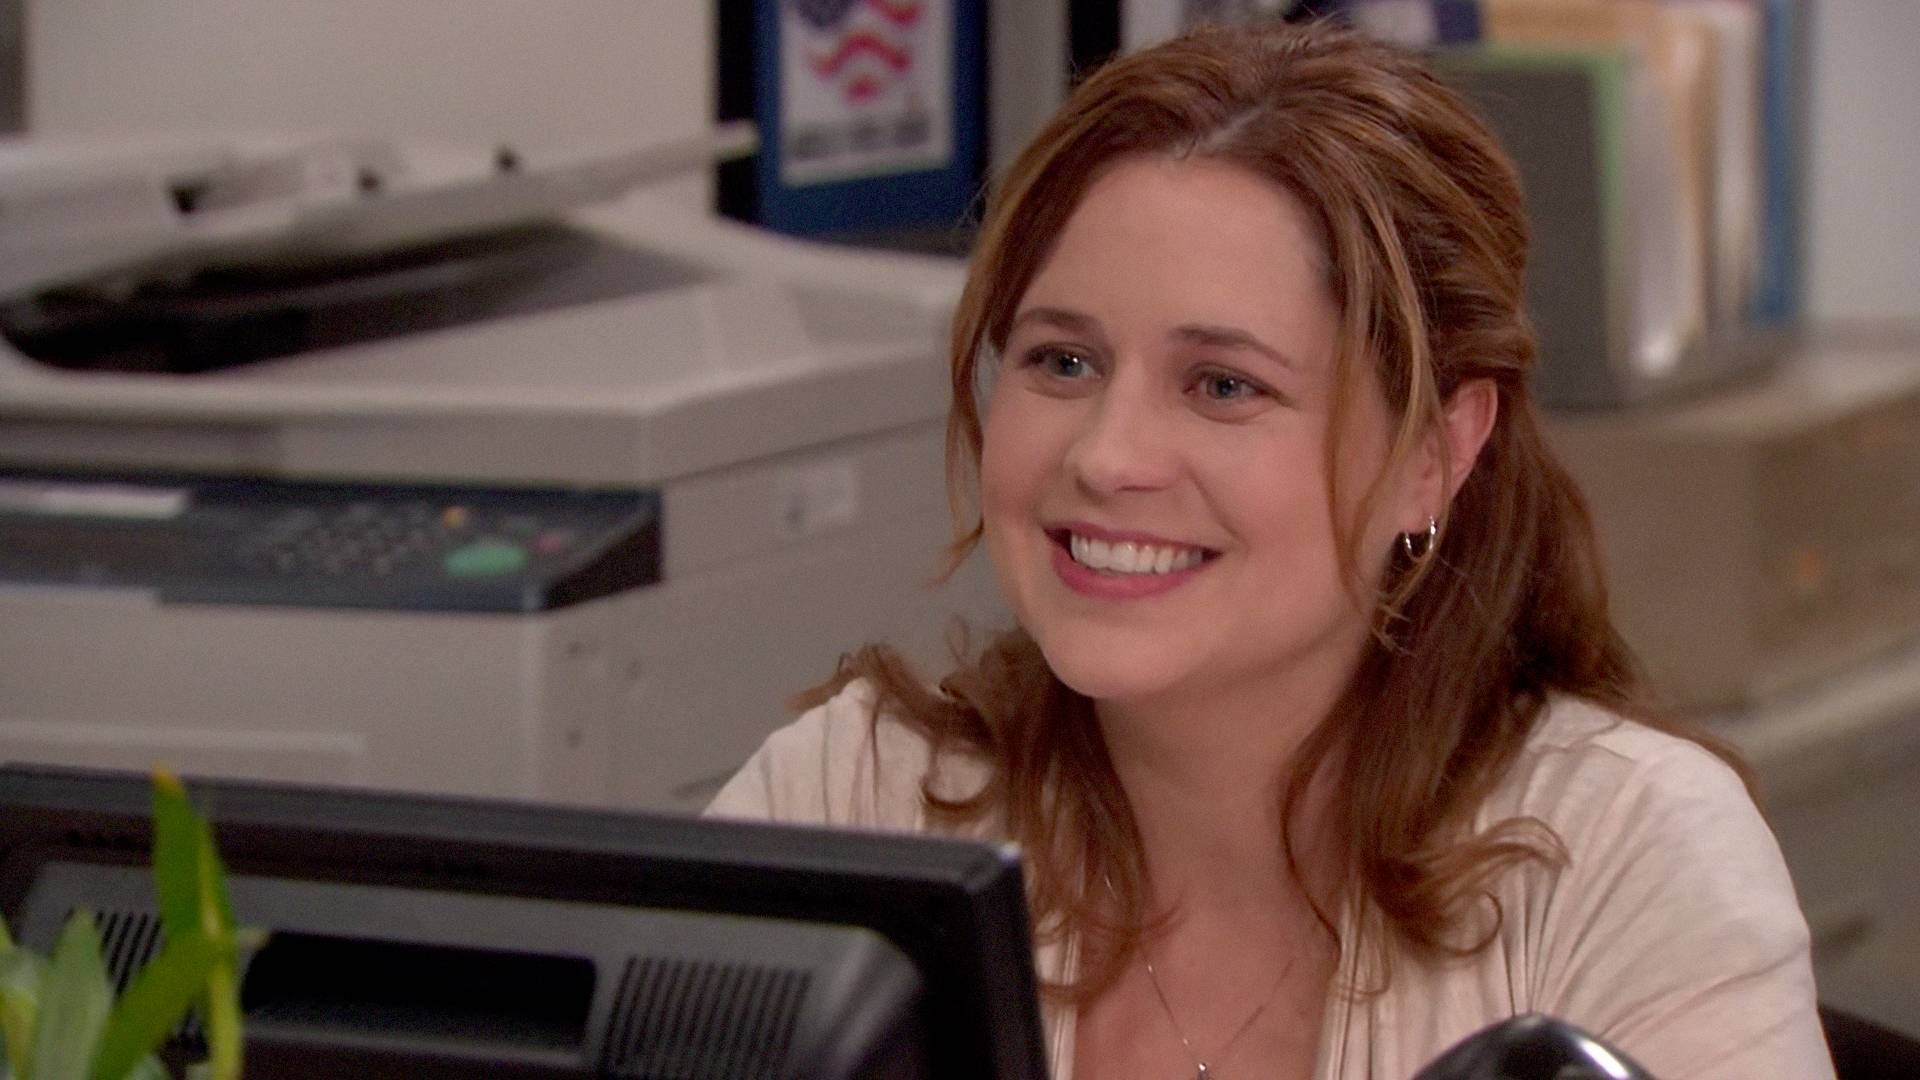 The Office Season 8 Episode 7